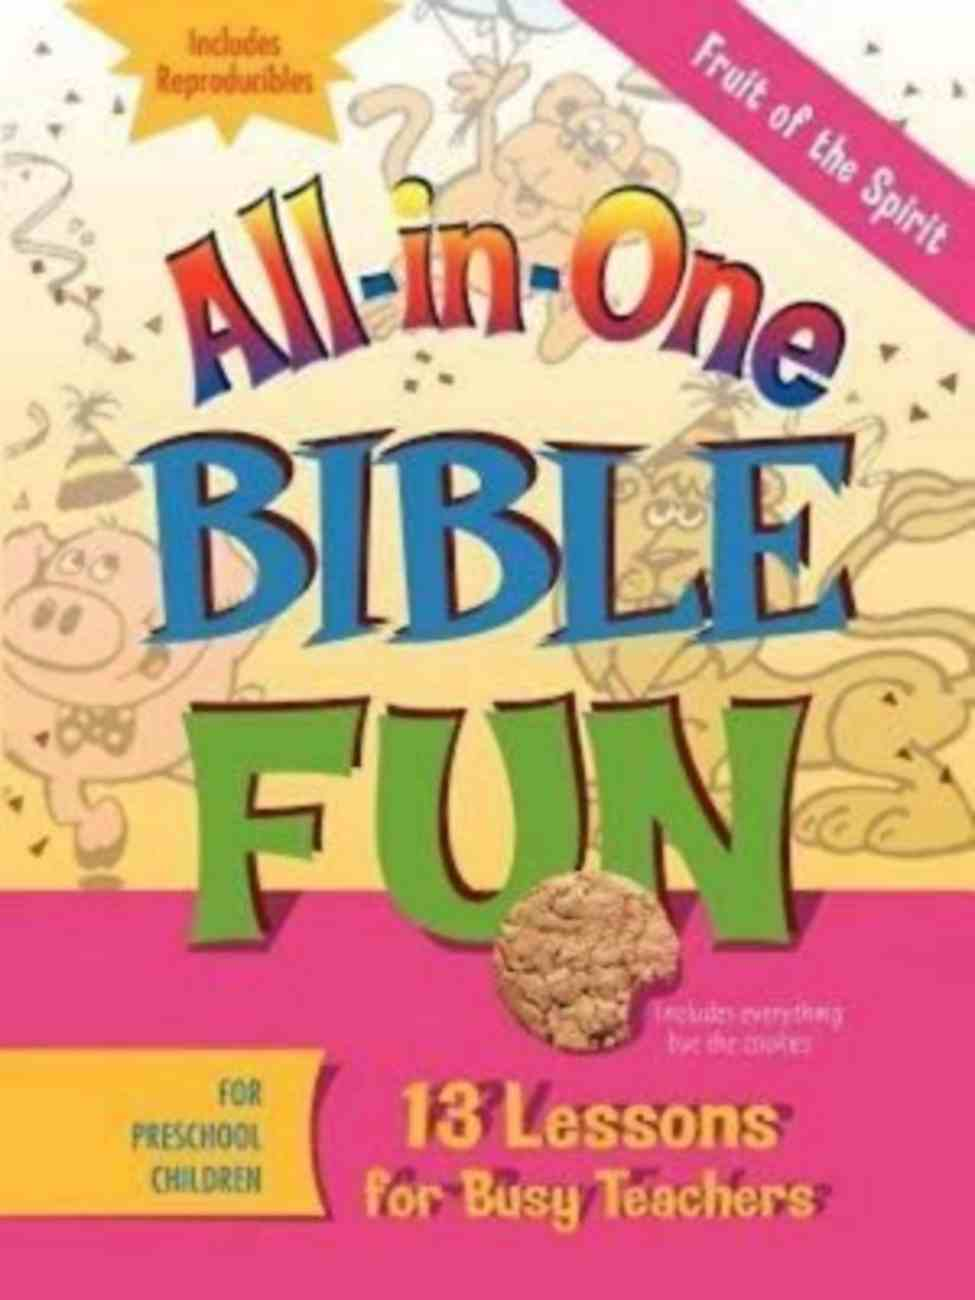 Fruits of the Spirit - Preschool (Bible Fun) (All In One Bible Fun Series) Paperback